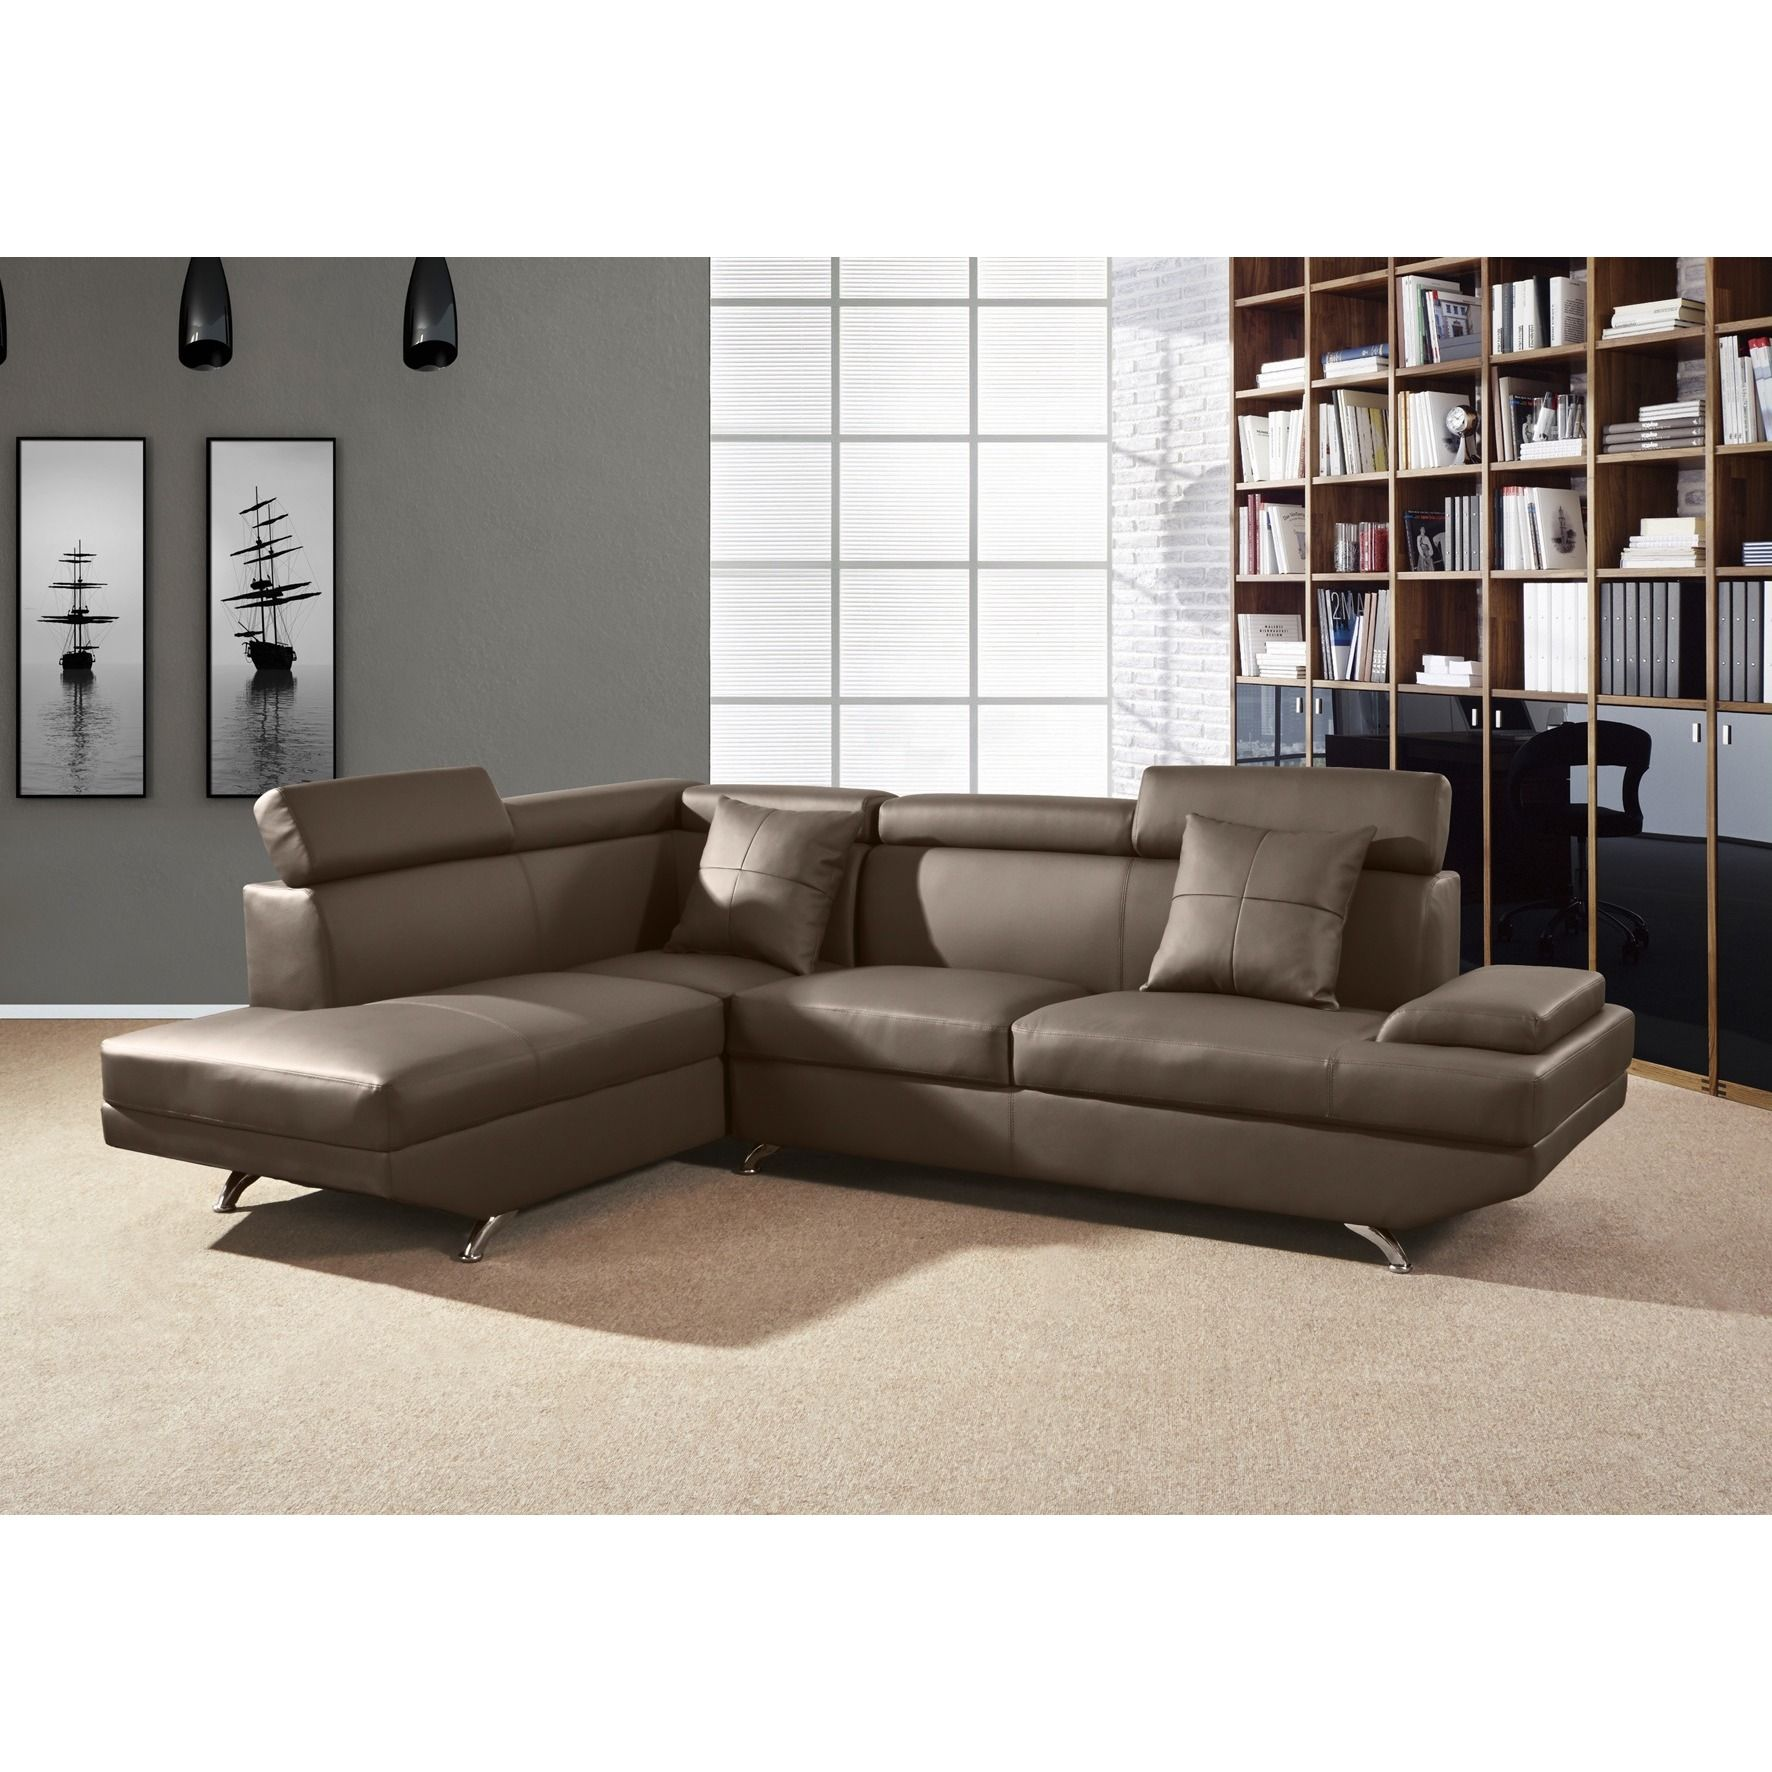 Elena leather 2 piece sectional sofa sofa menzilperdenet for Elena leather 2 piece sectional sofa sofa chaise